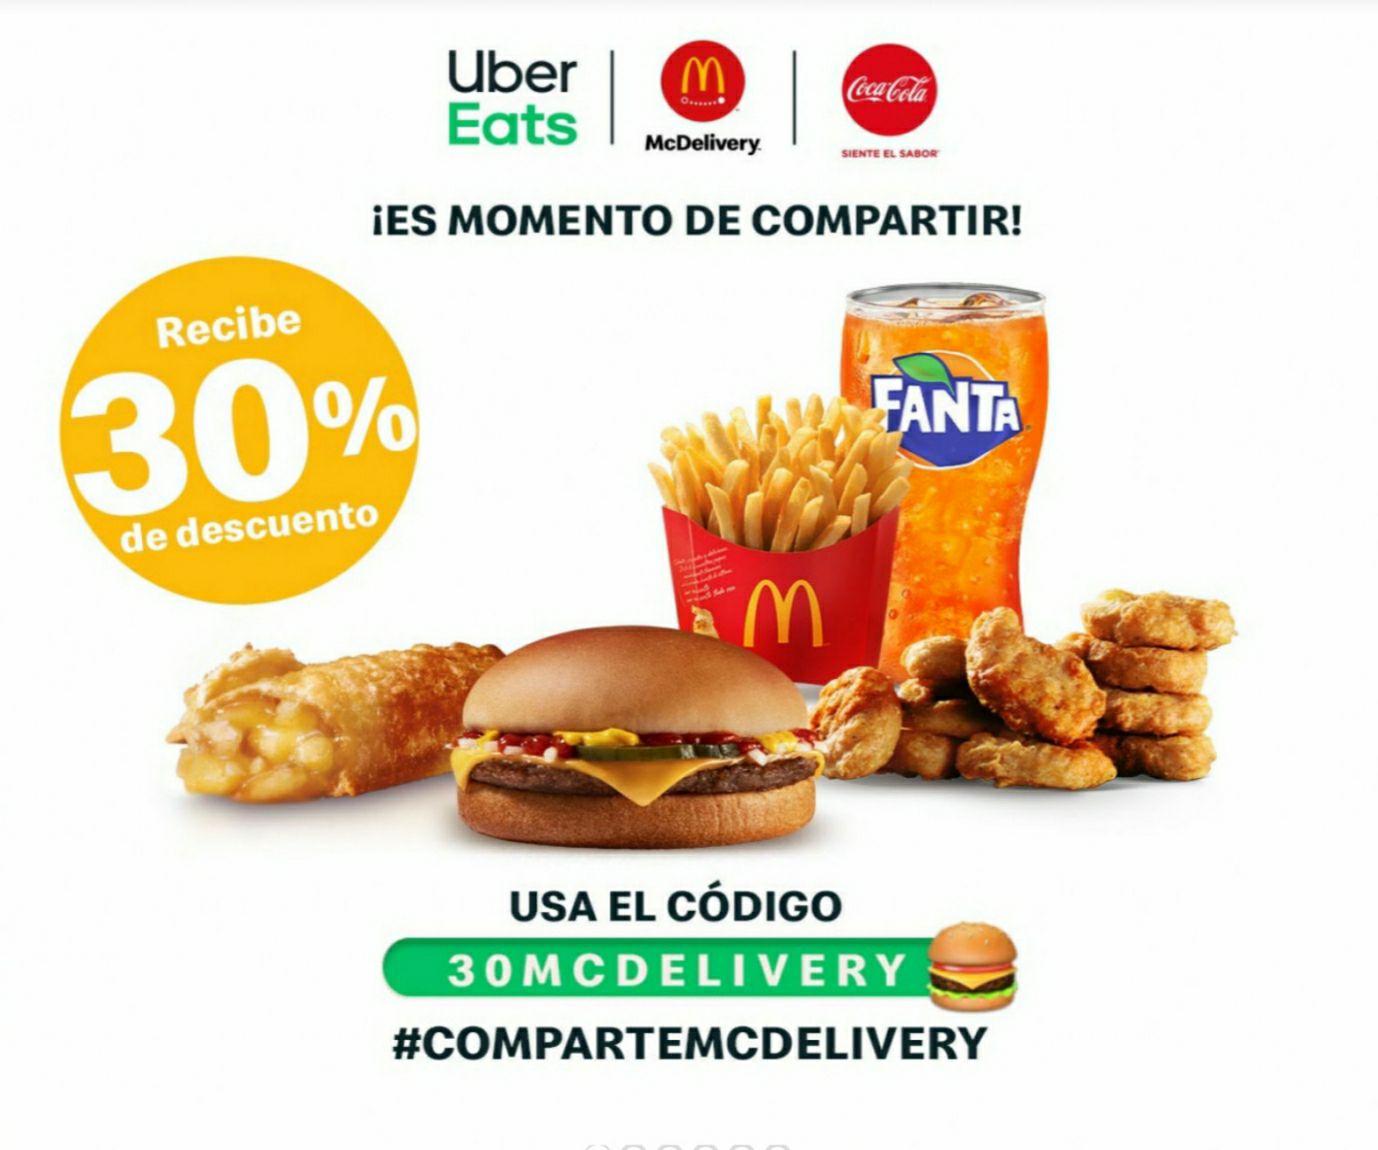 McDonald's en Uber Eats: 30% de Descuento